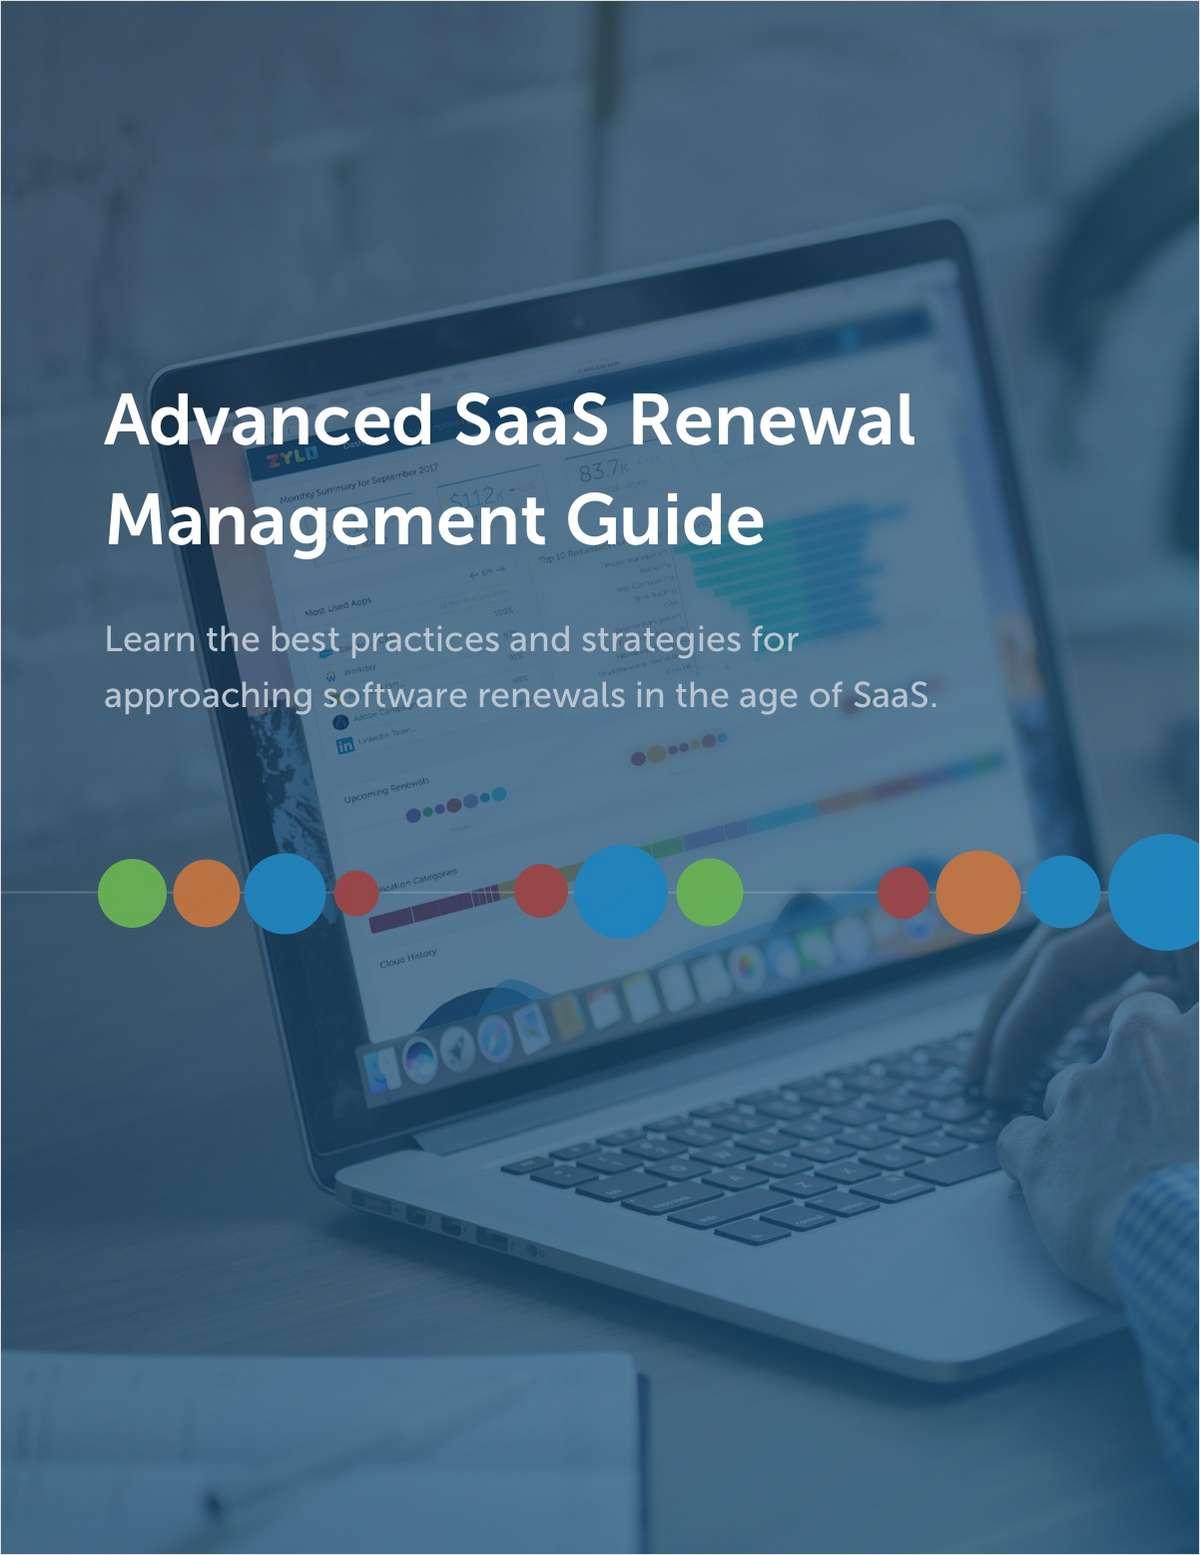 Advanced SaaS Renewal Management for IT Procurement